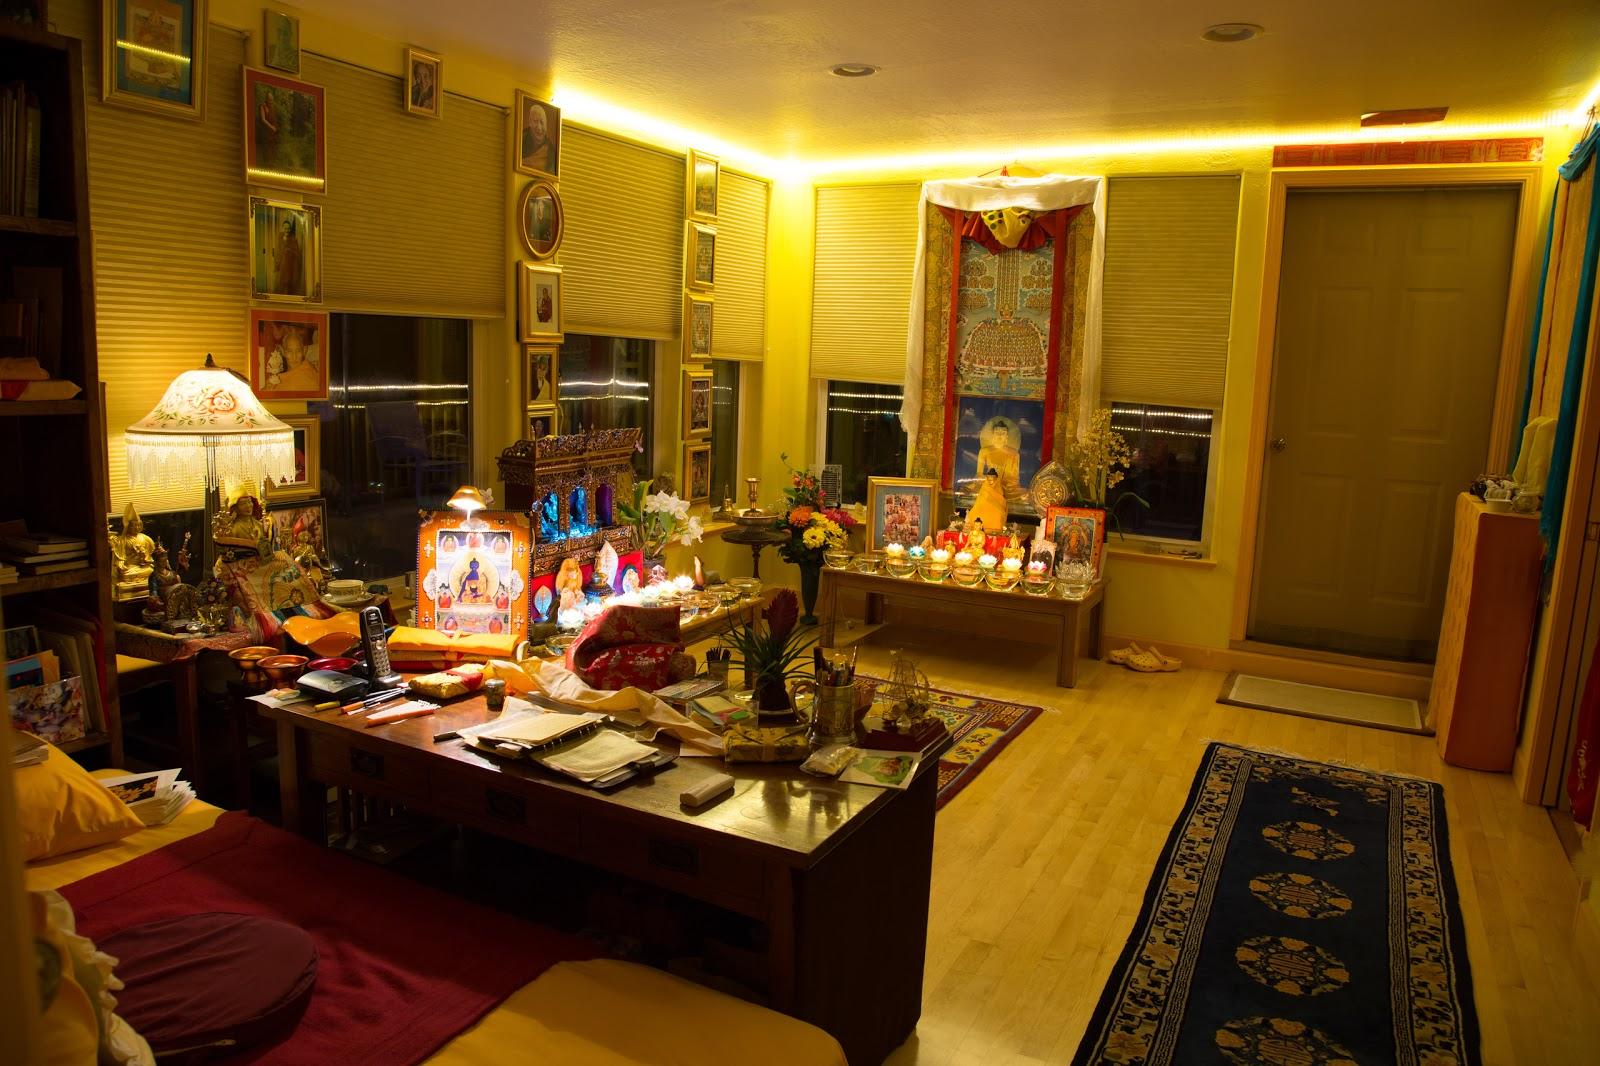 Prajnaparamita room. Photo by Ven. Thubten Kunsang.